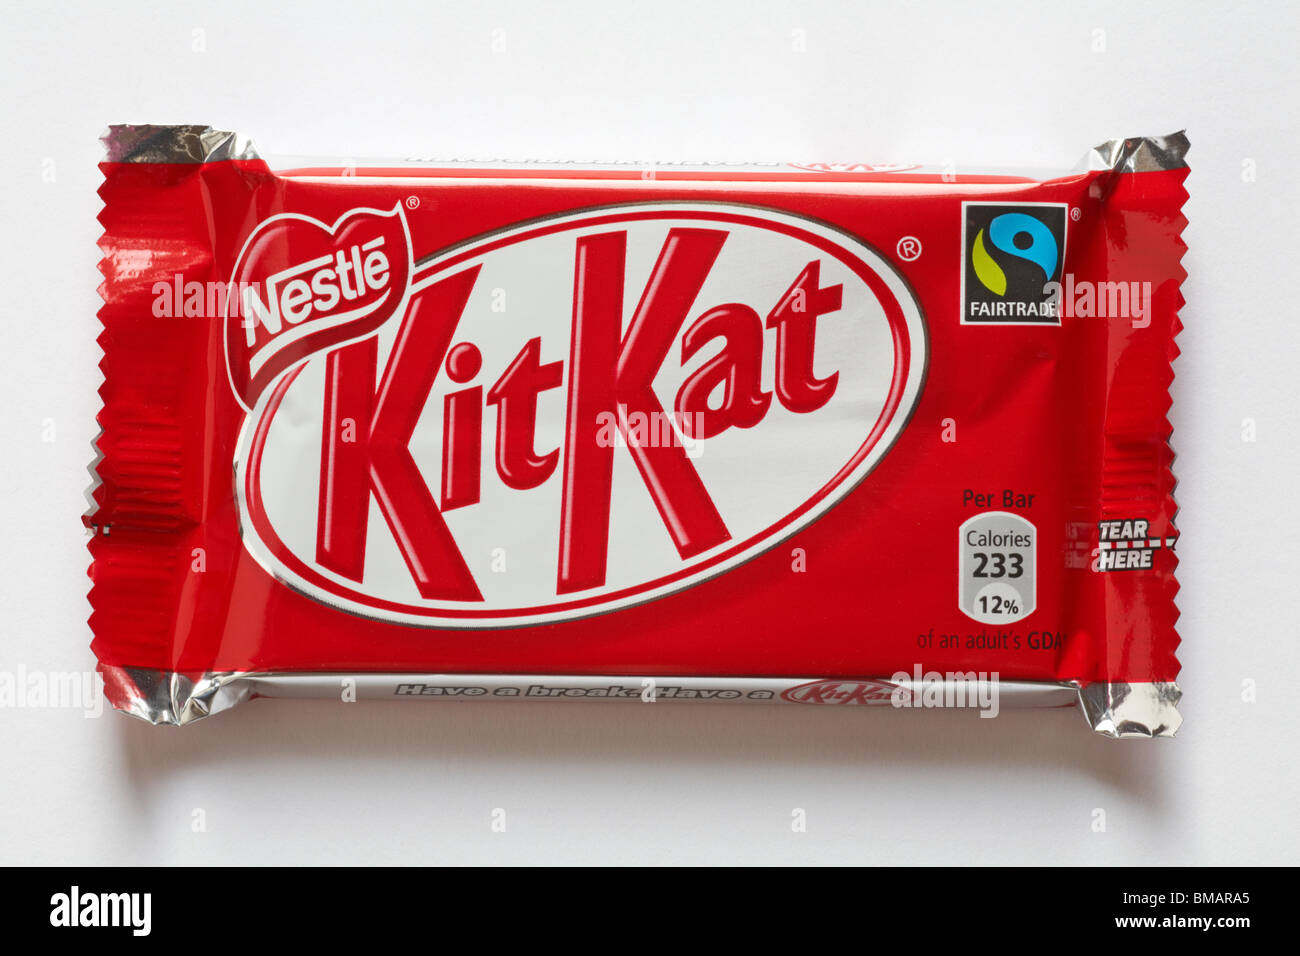 nestle kitkat milk chocolate bar - kitkat kit-kat kit kat chocolate